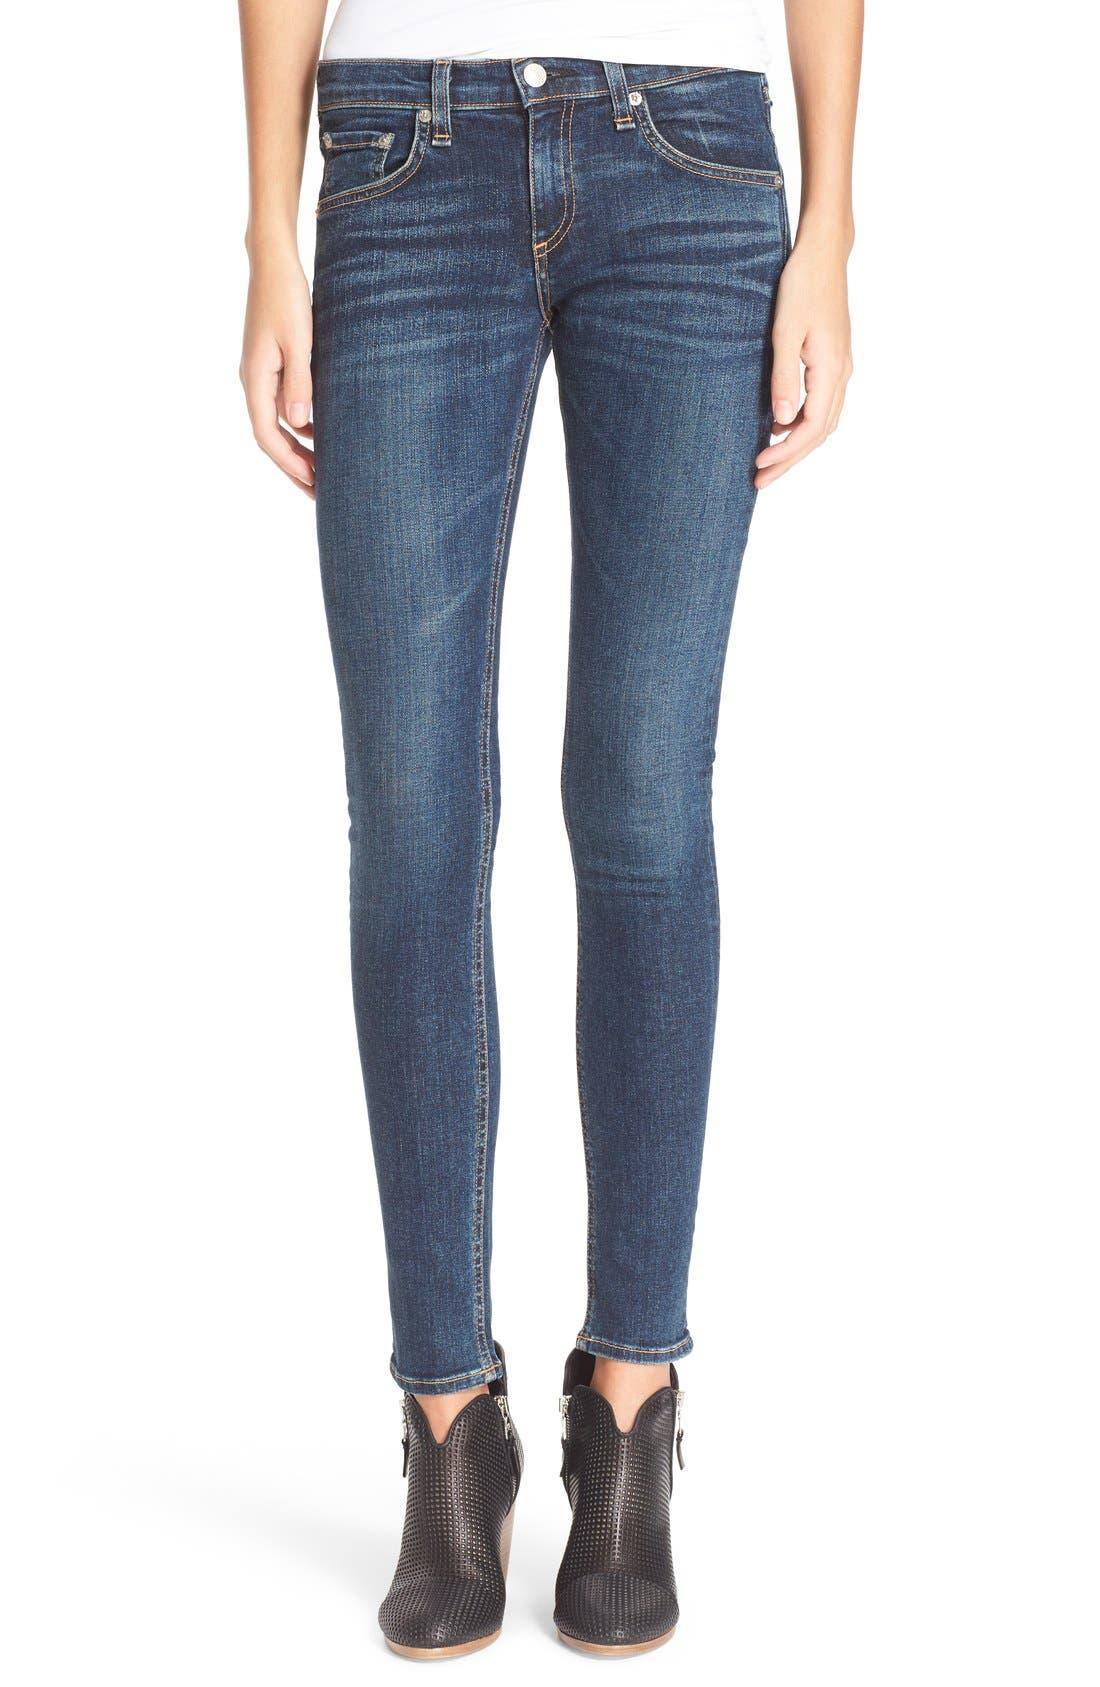 Alternate Image 1 Selected - rag & bone/JEAN Skinny Jeans (Phoenicia)